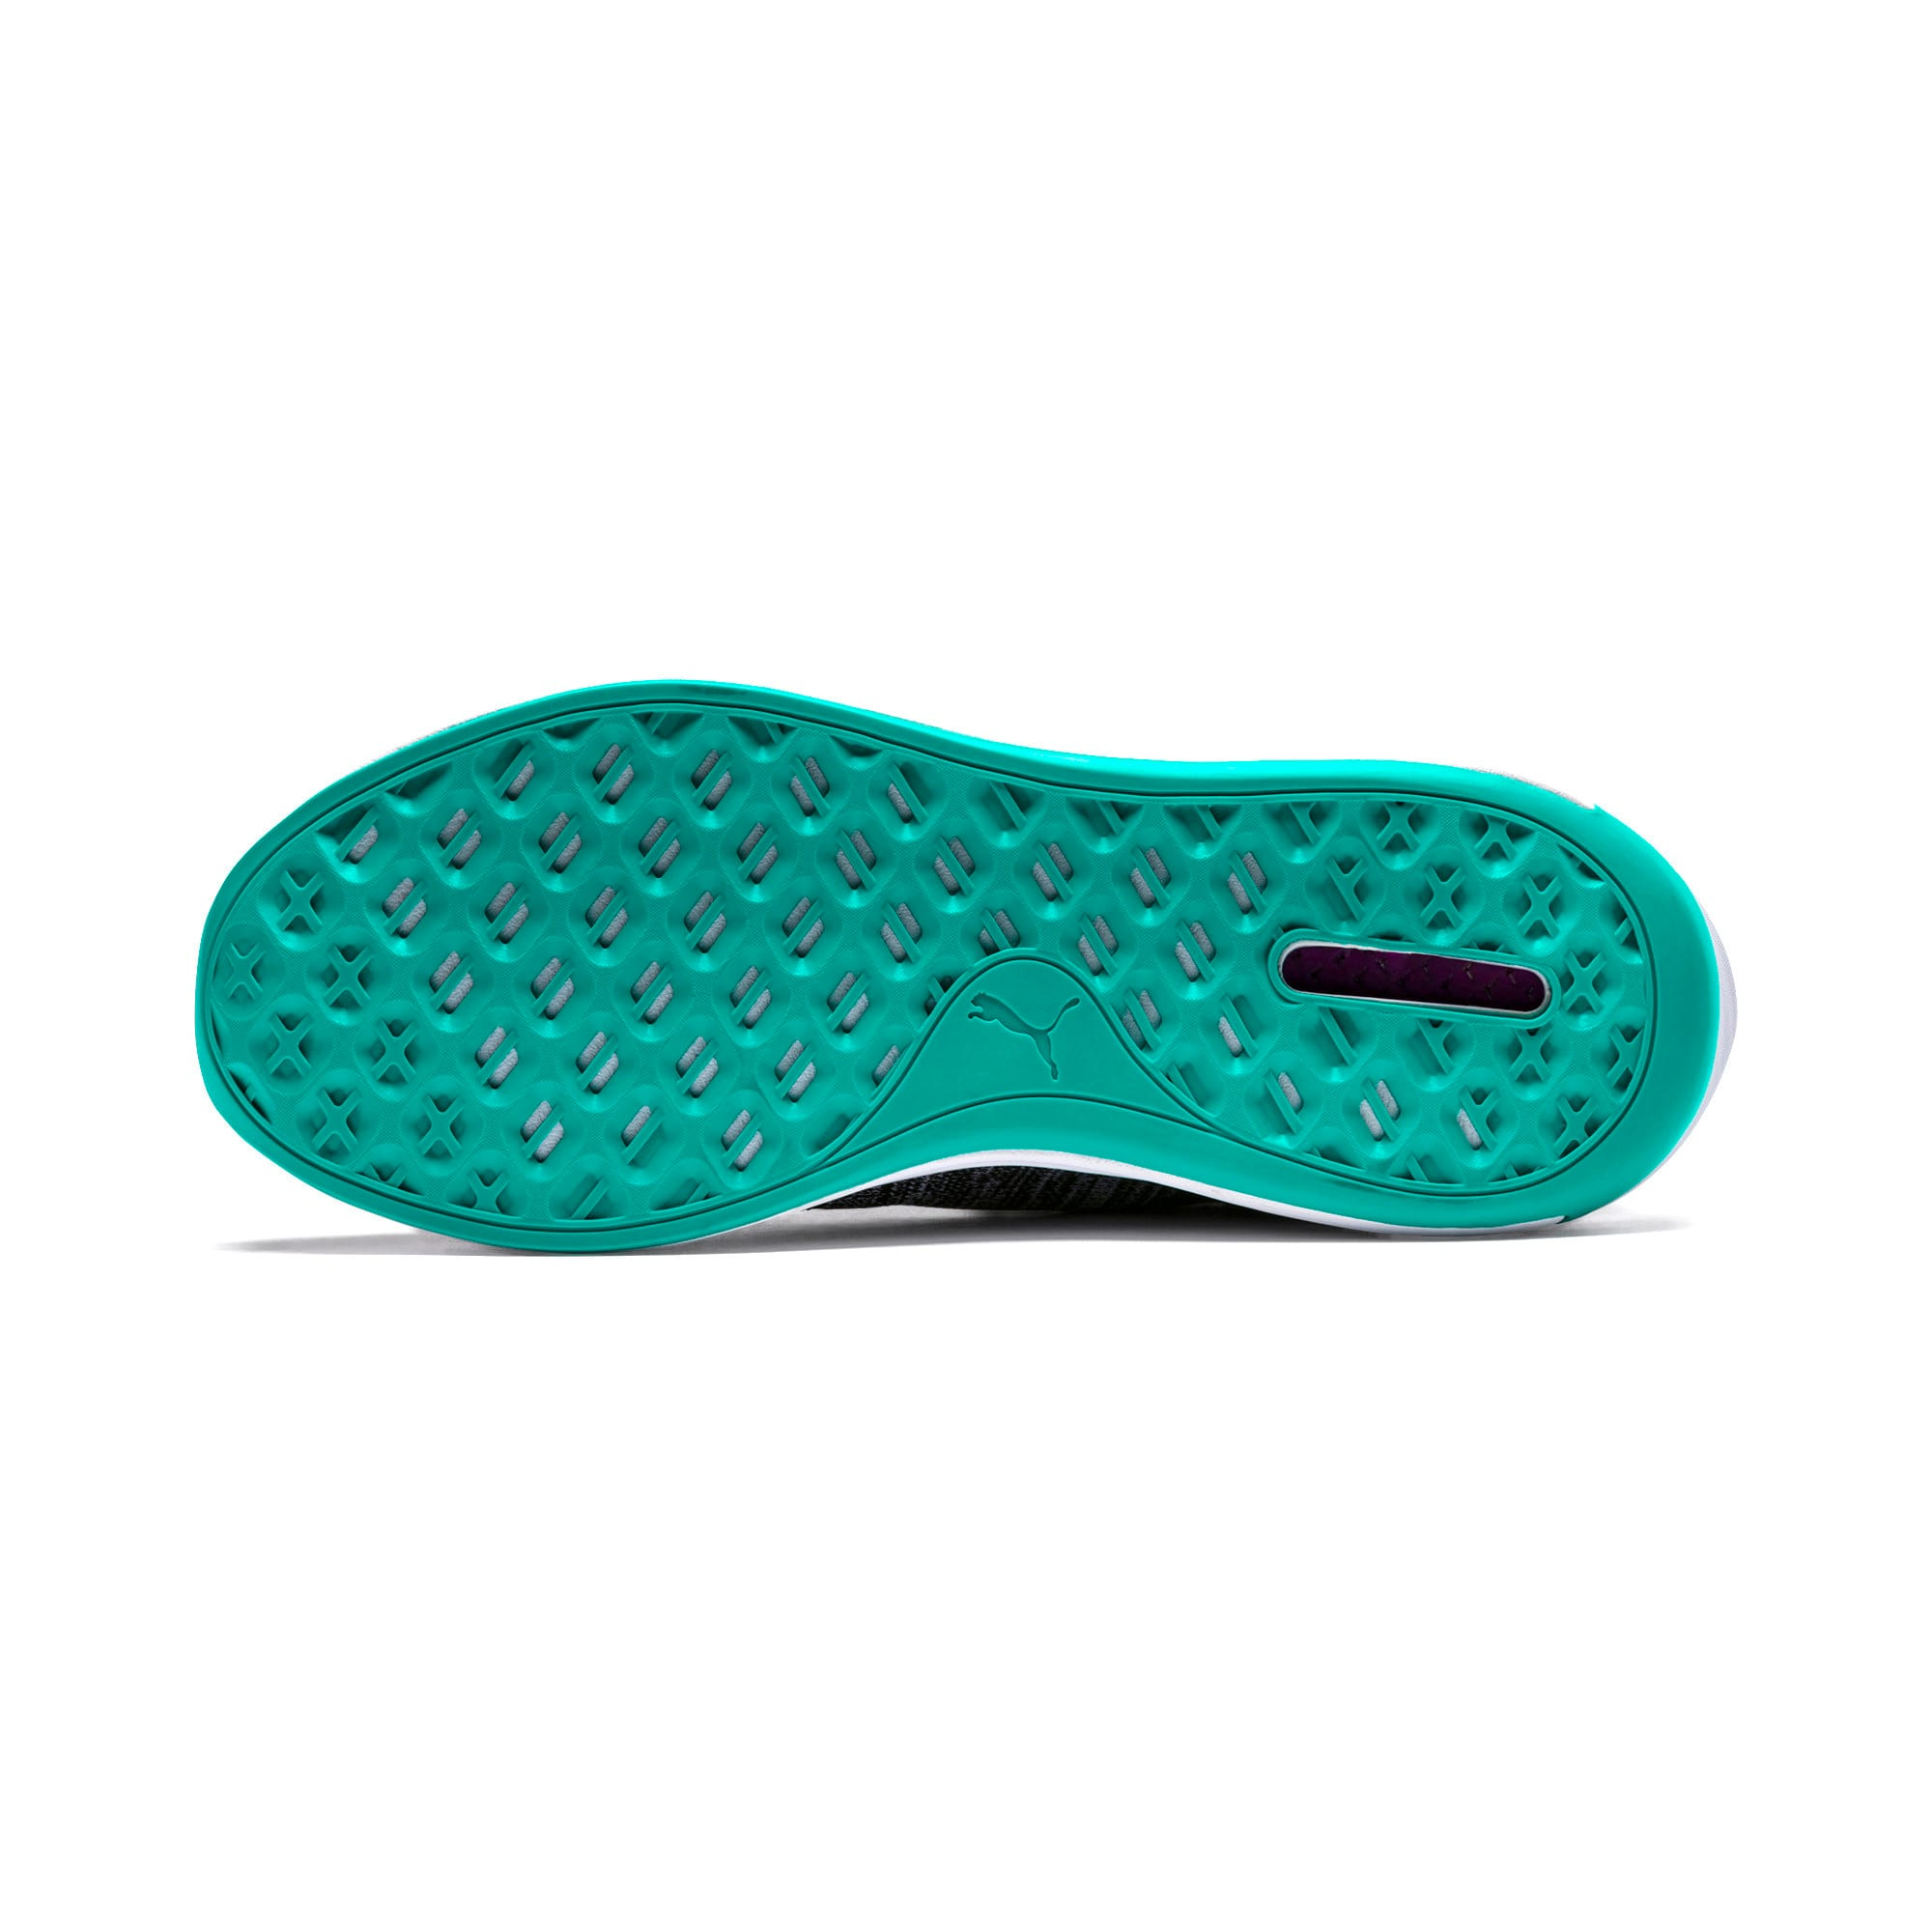 Thumbnail 3 of IGNITE Limitless SR evoKNIT Men's Sneakers, Puma Black-Spectra Green, medium